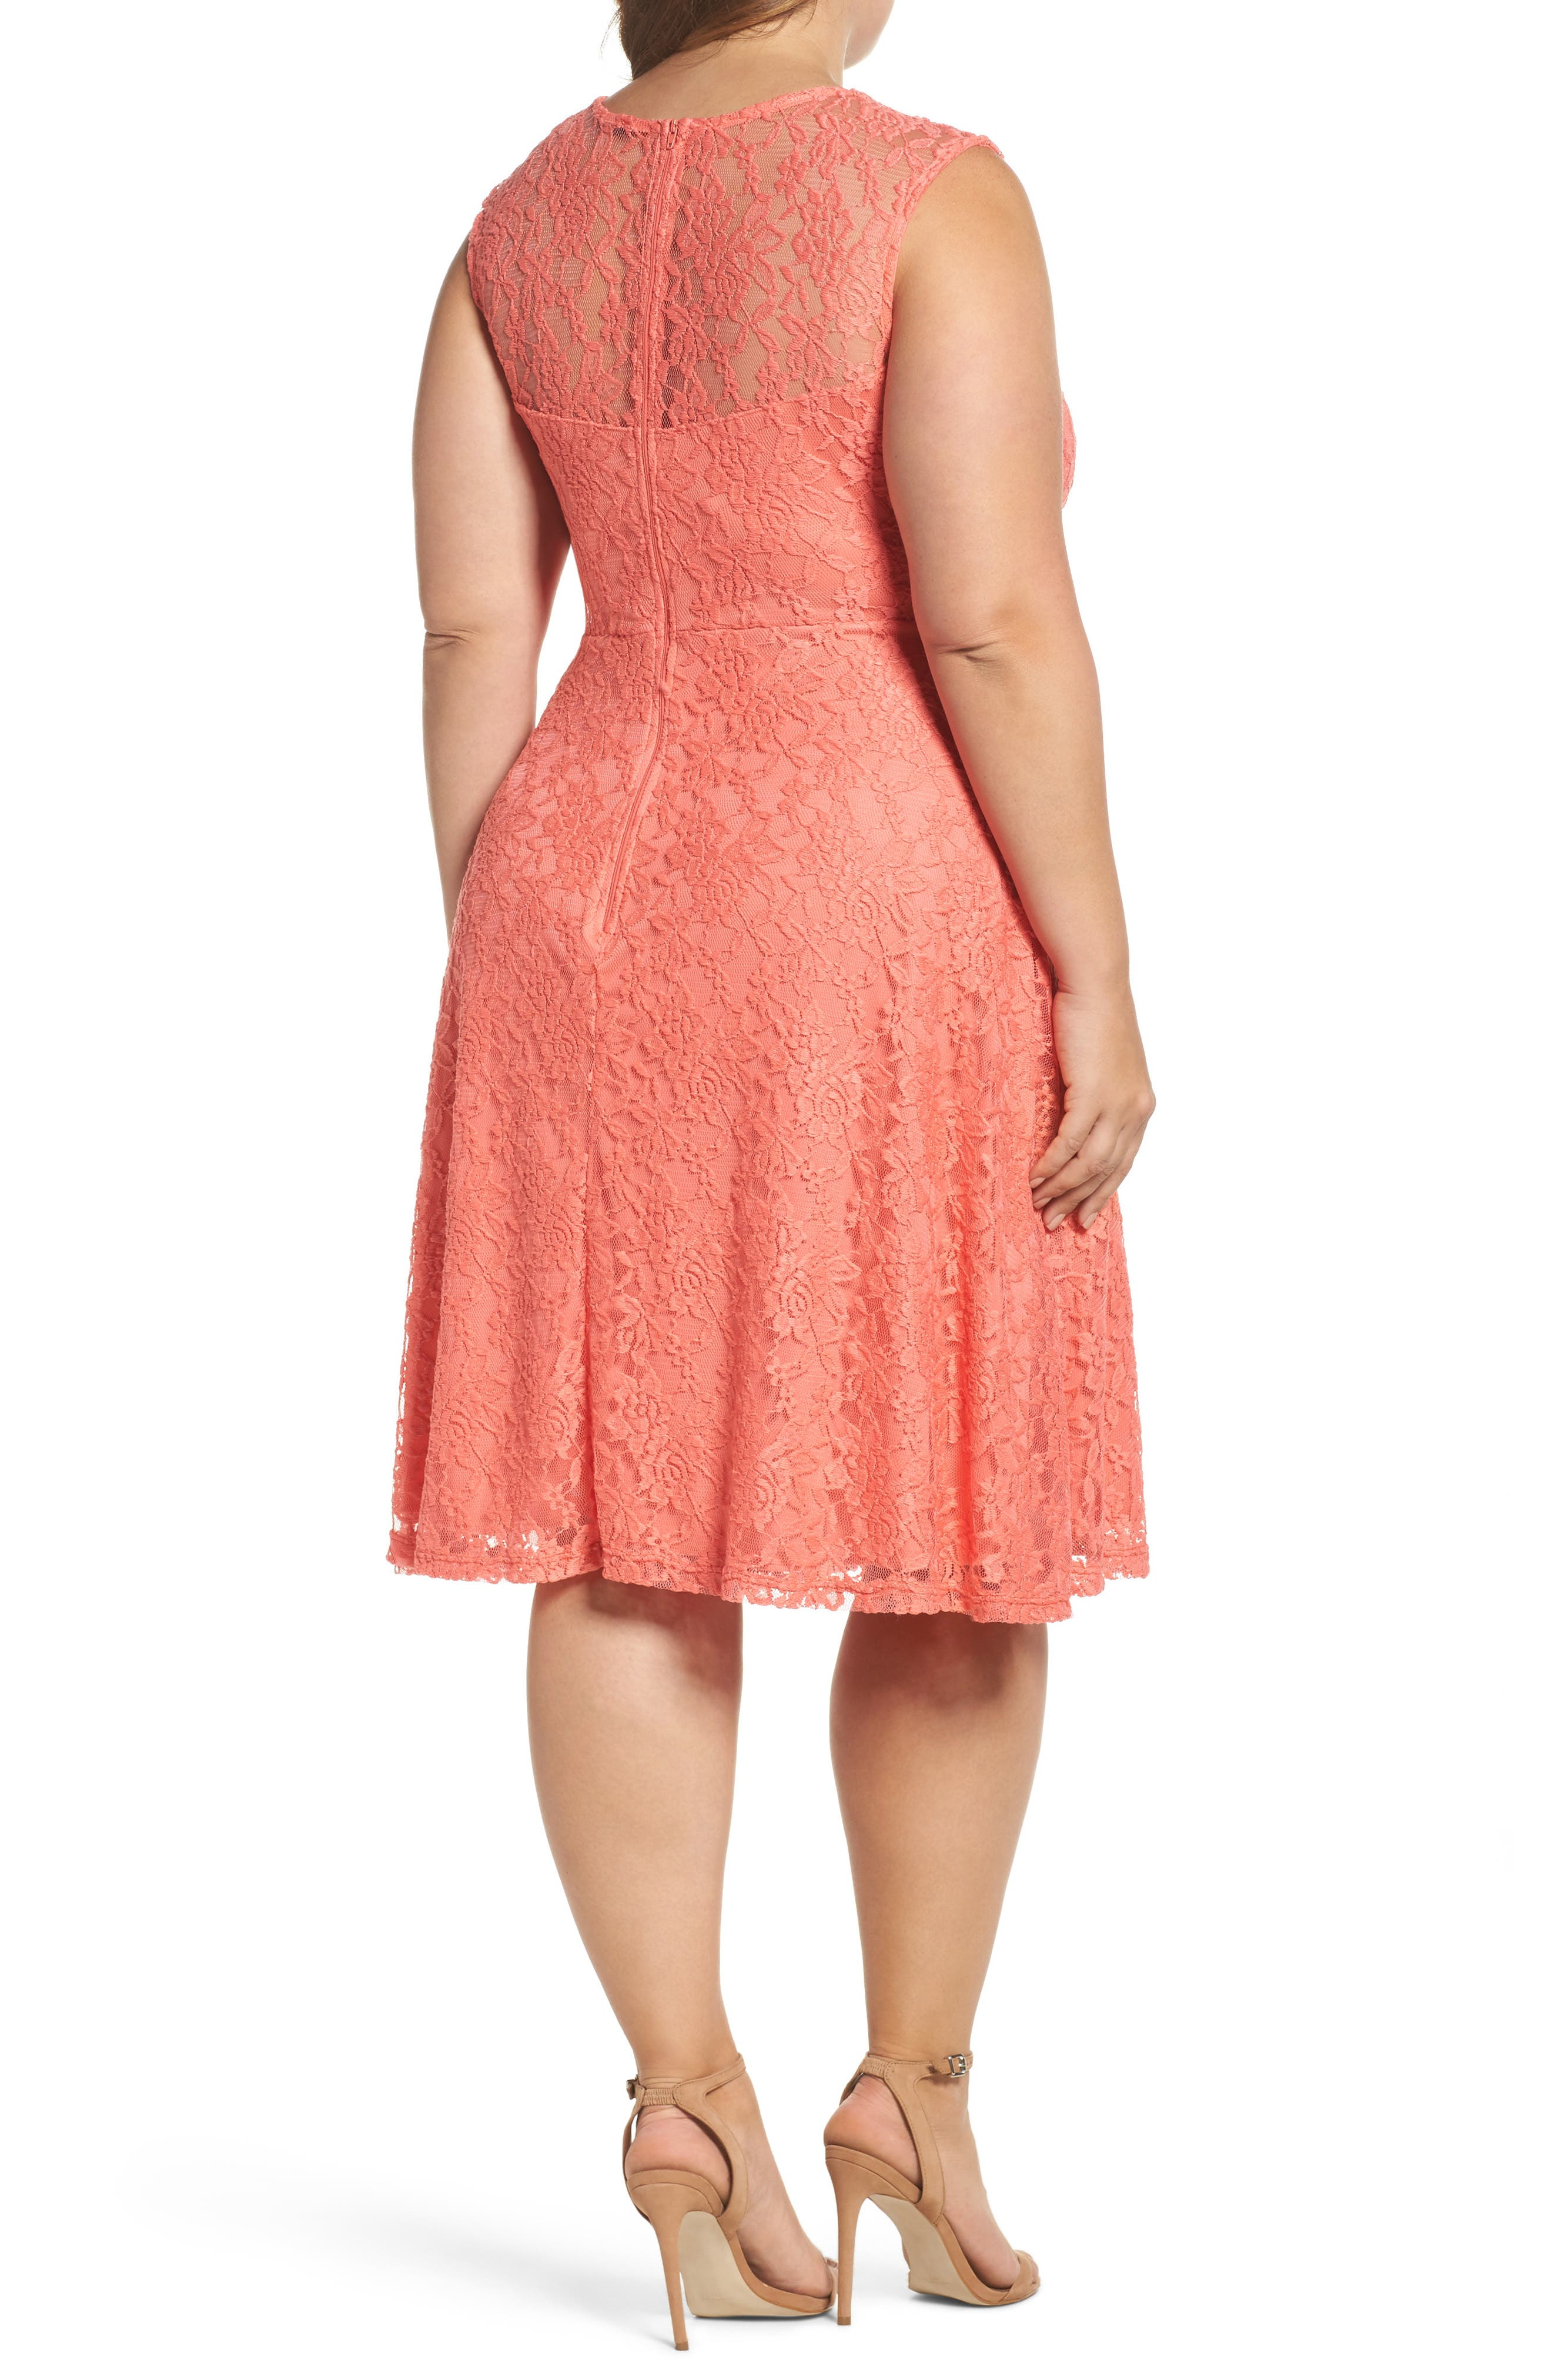 Lace Skater Dress,                             Alternate thumbnail 2, color,                             Coral